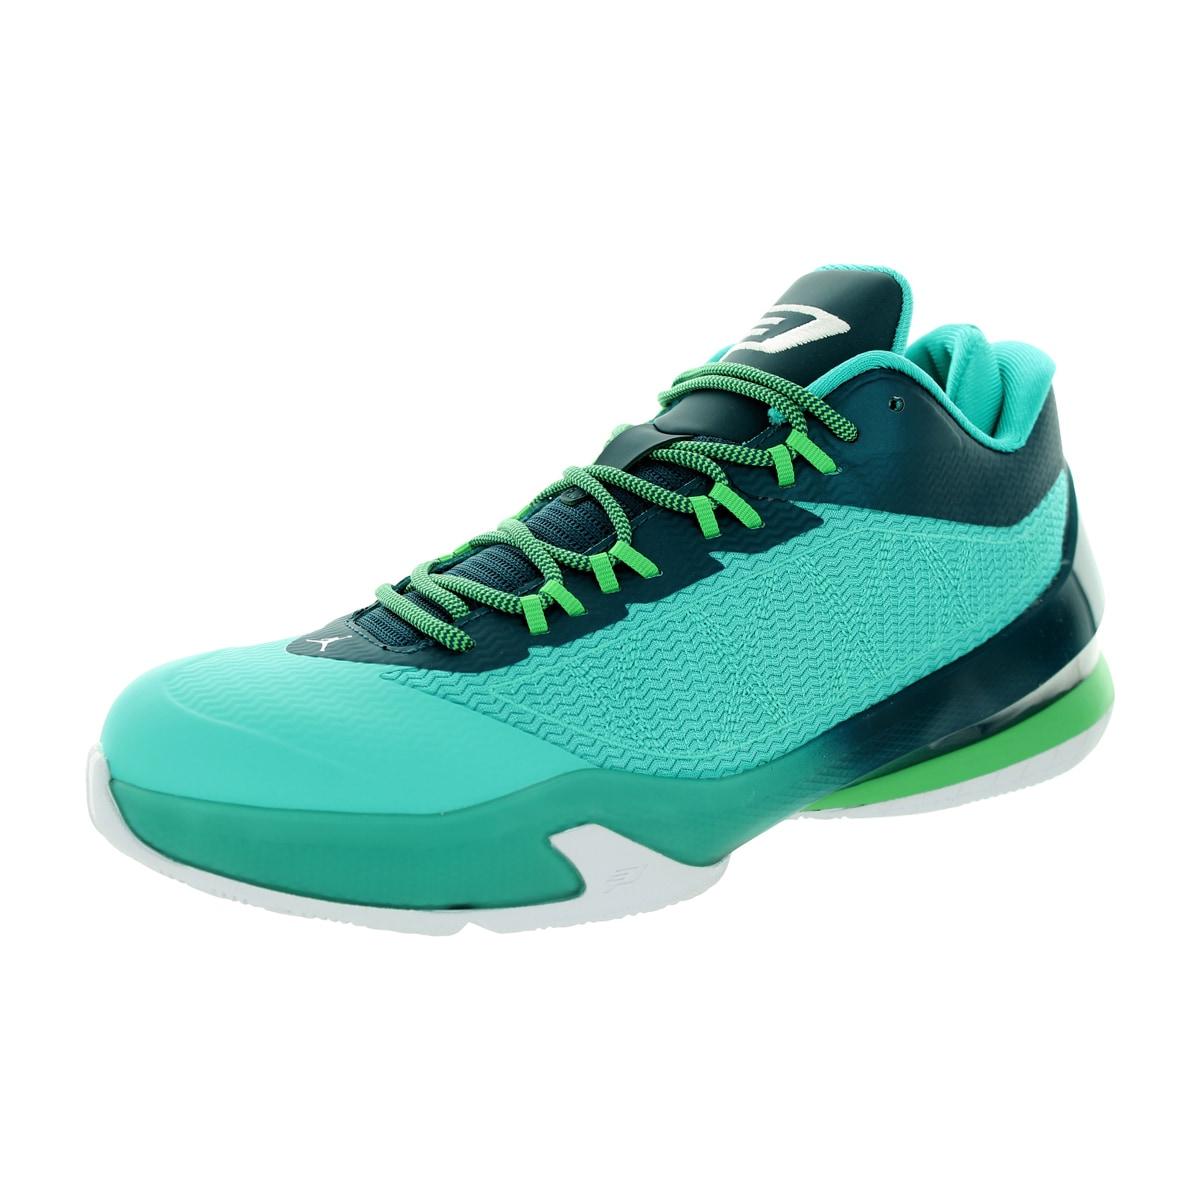 8f499be151ad Shop Nike Jordan Men s Jordan Cp3.Viii Retro White Teal Black Basketball  Shoe - Free Shipping Today - Overstock - 12318562